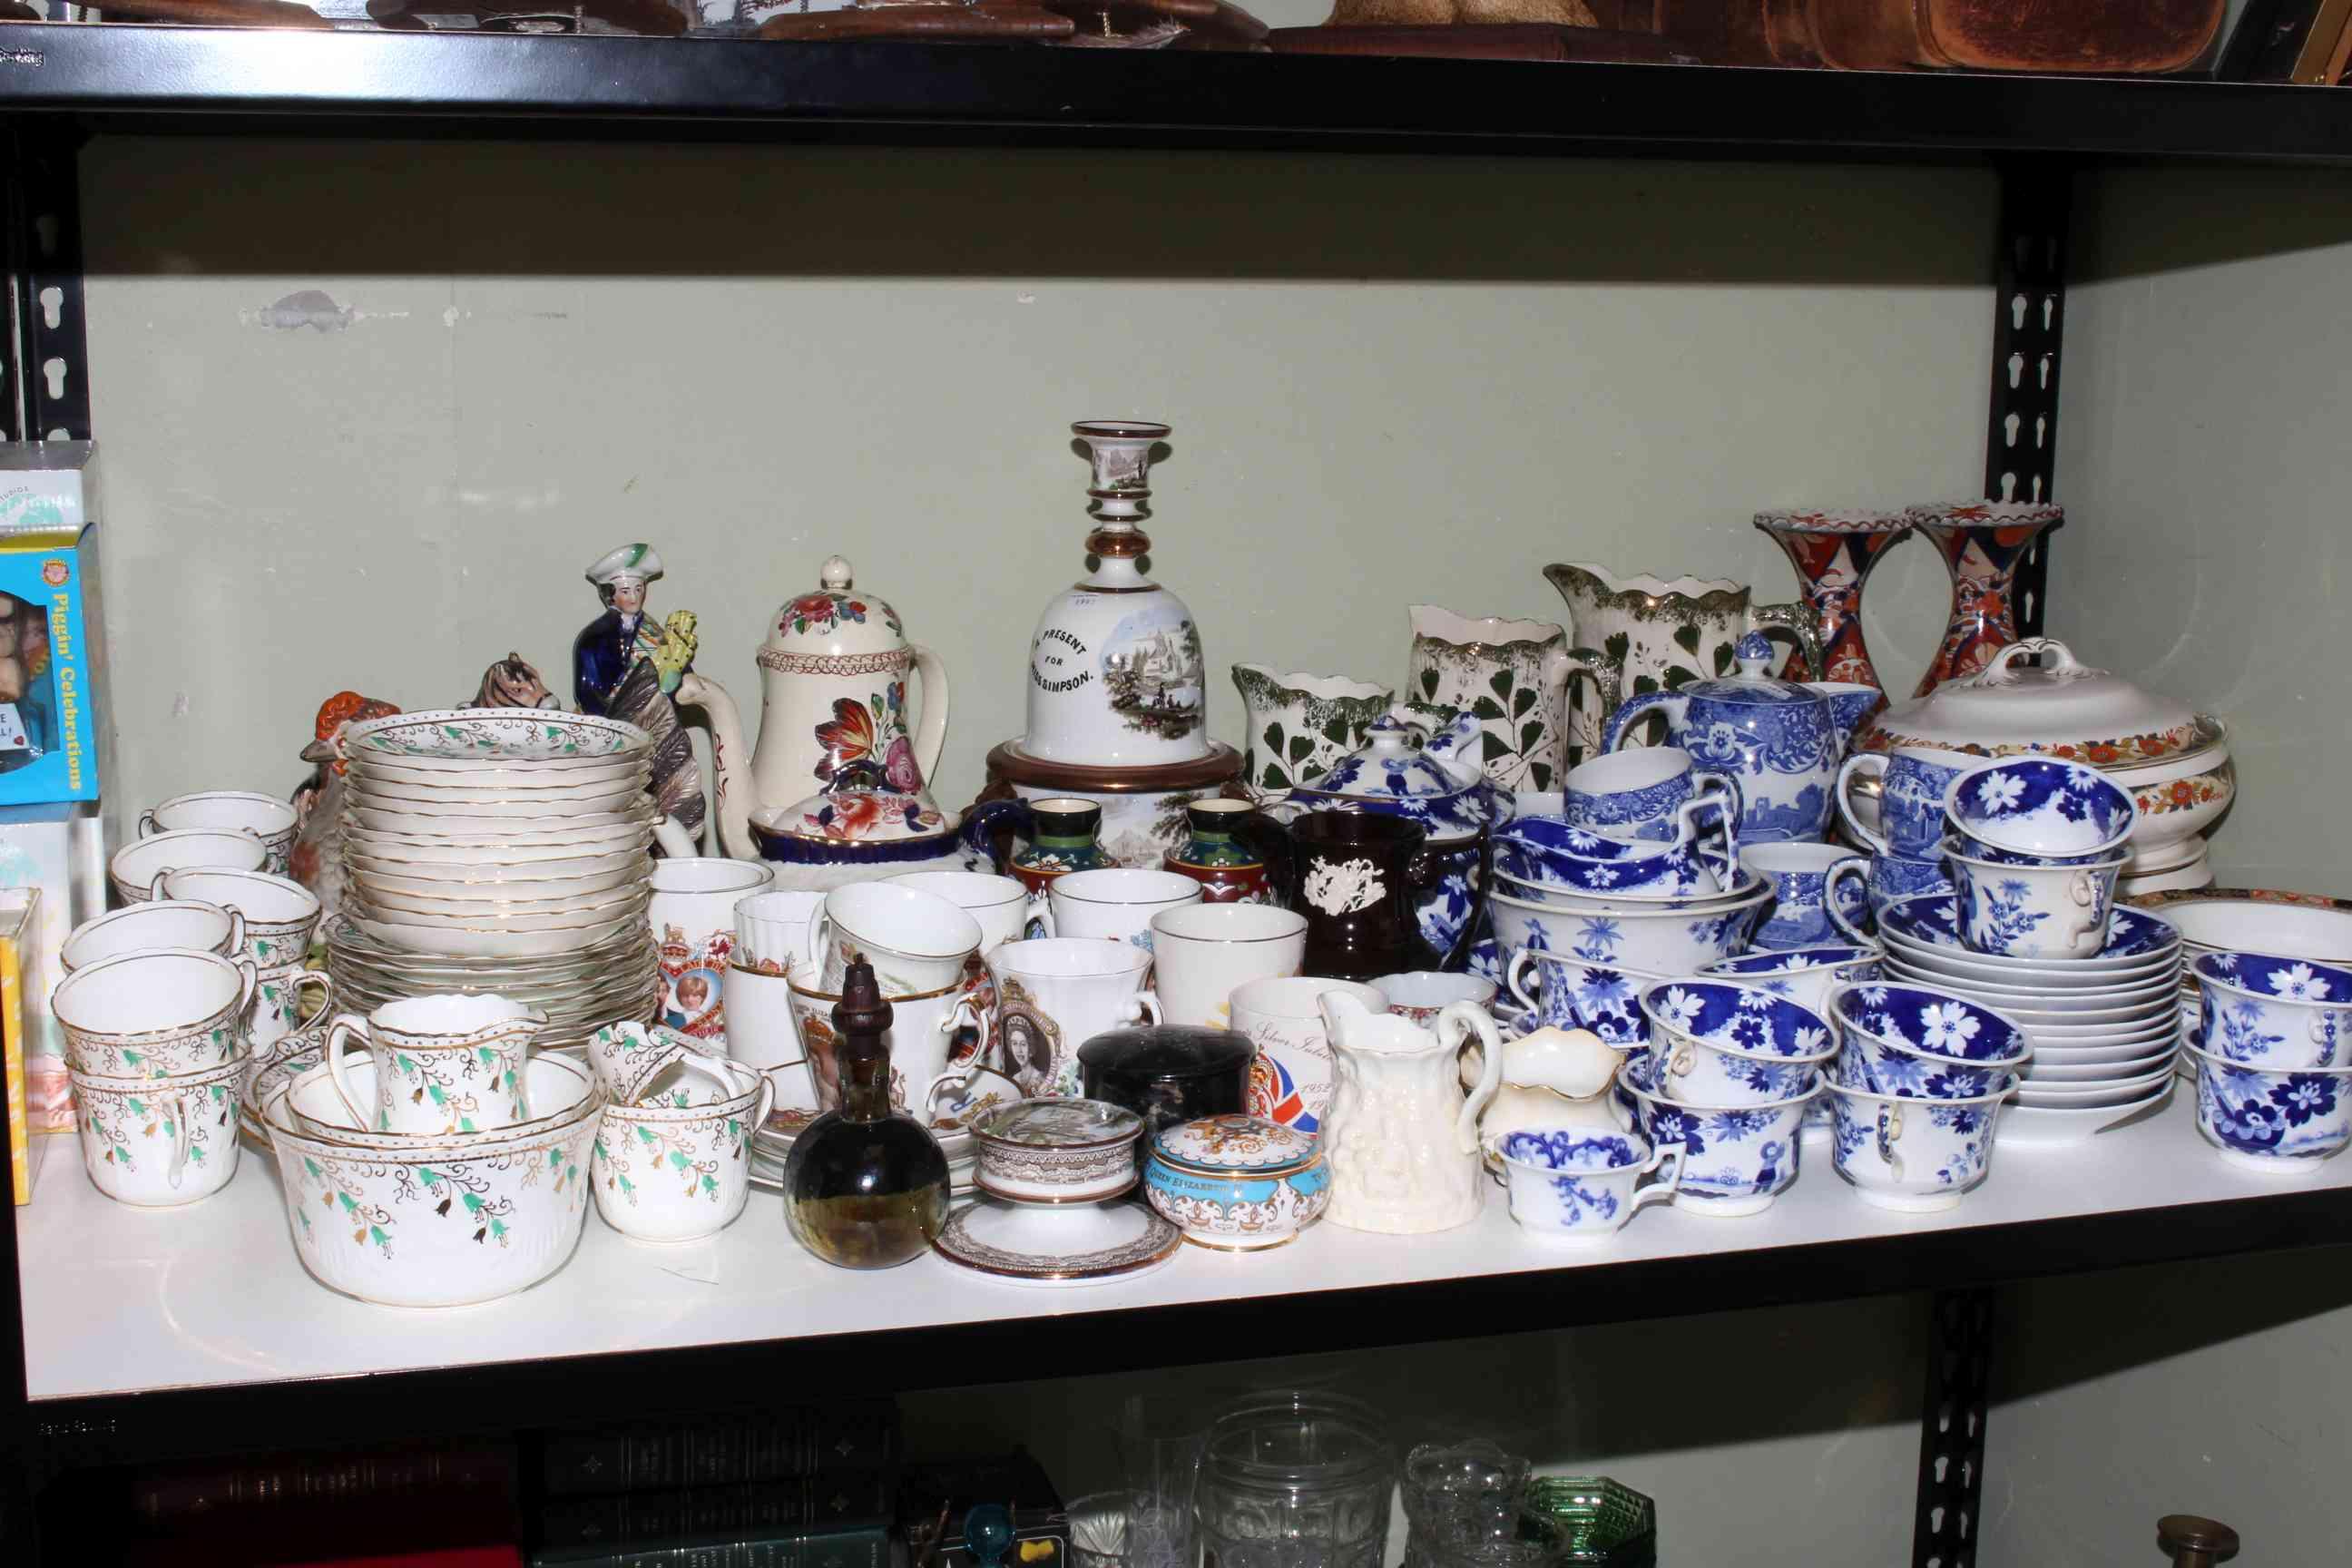 Lot 67 - Shelf of ceramics including tureen, commemorative, teapots and framed prints, etc.